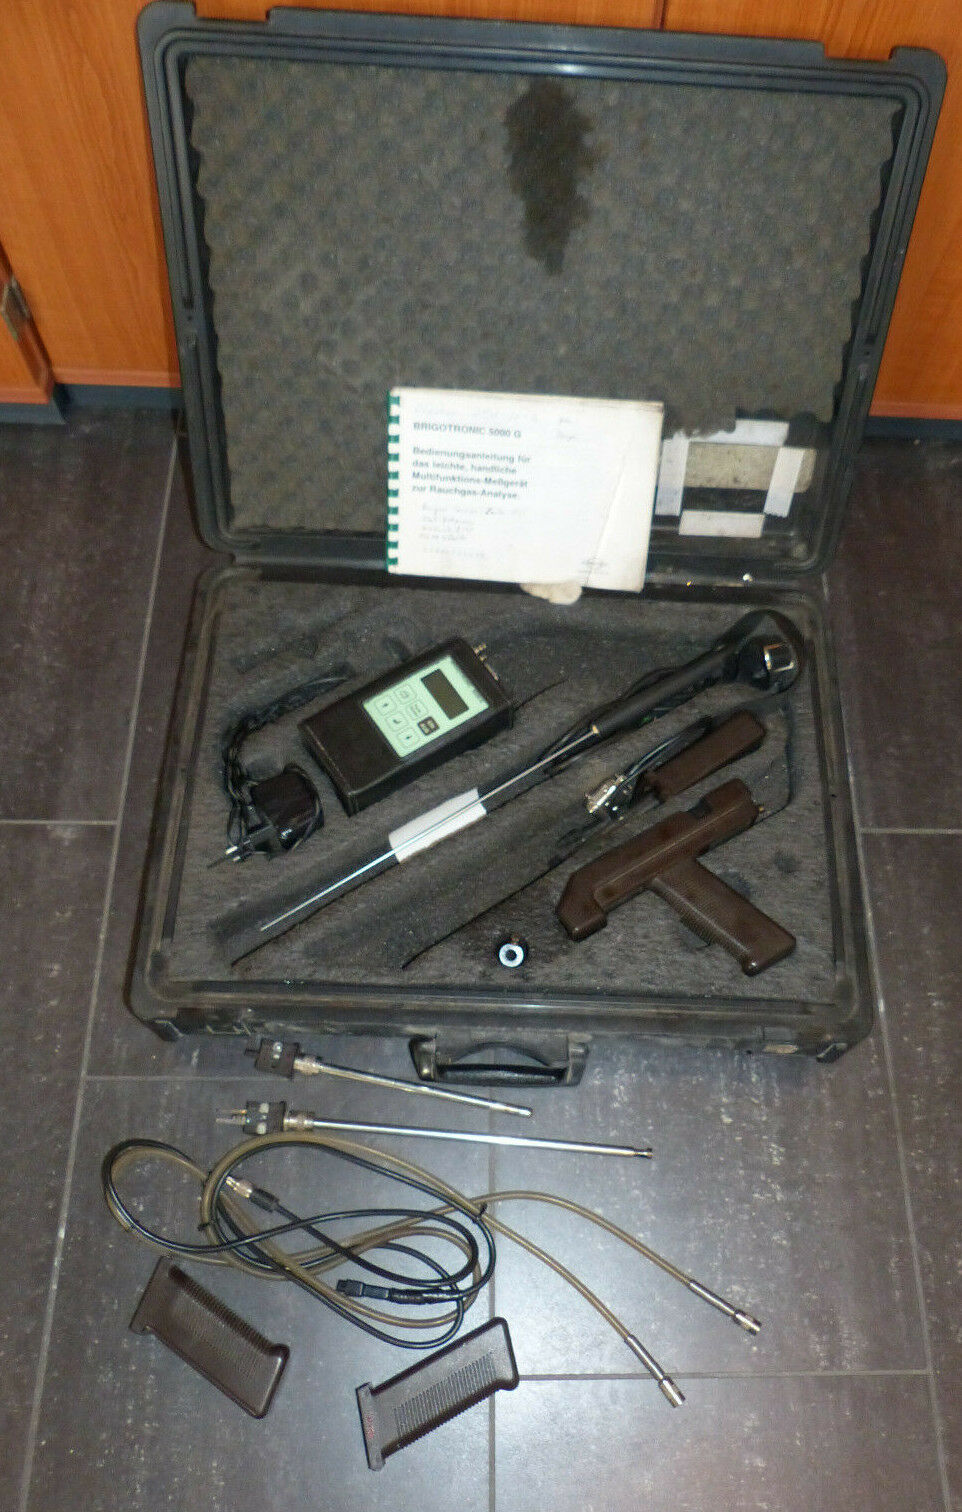 Brigon Brigotronic 5000 G Rauchgas Messgerät Abgasanalysegerät im Koffer